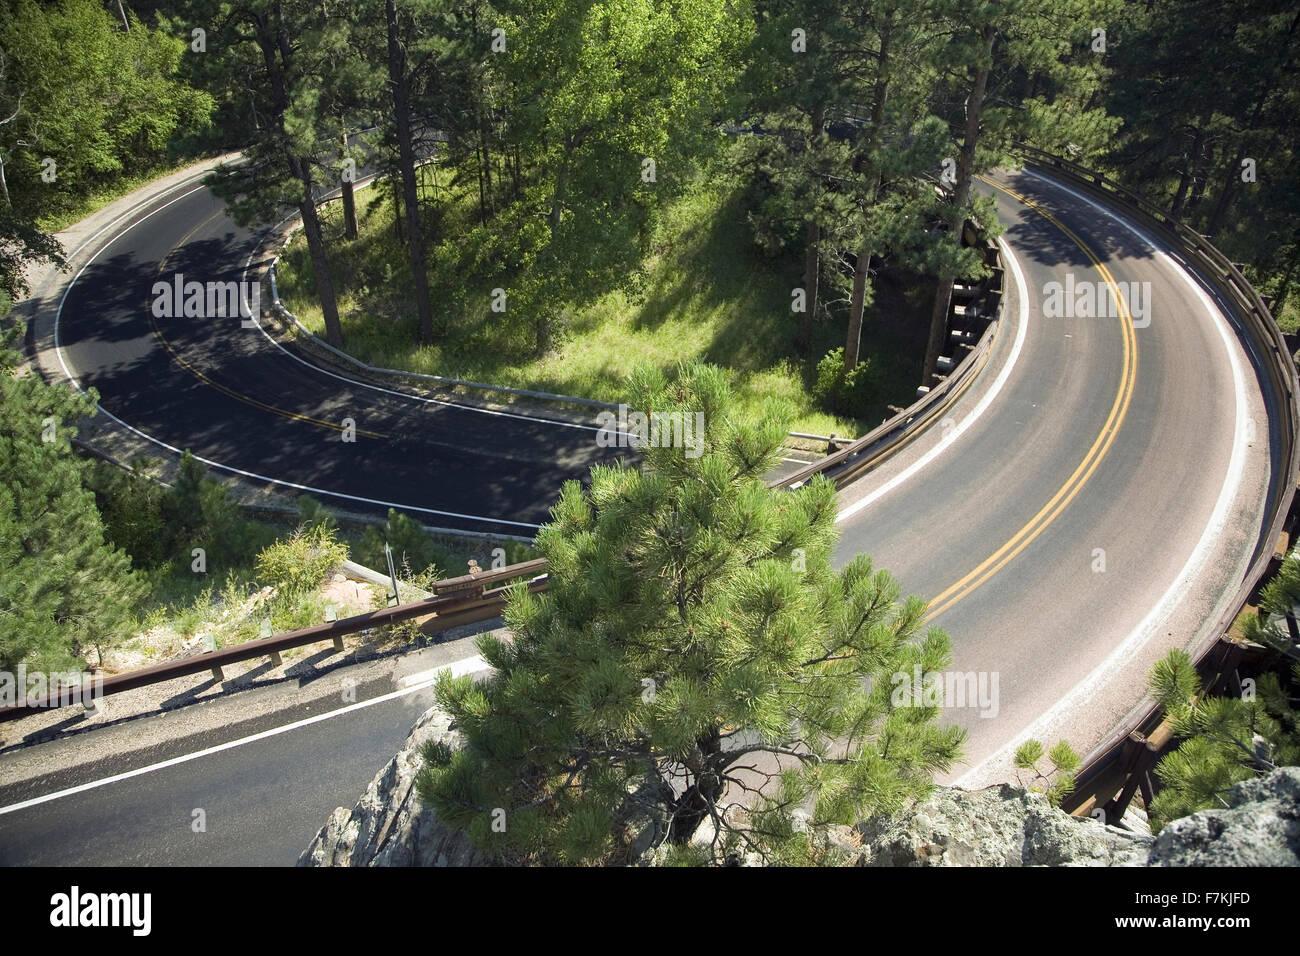 Circular loop on Iron Mountain Road, Black Hills, near Mount Rushmore National Memorial, South Dakota - Stock Image